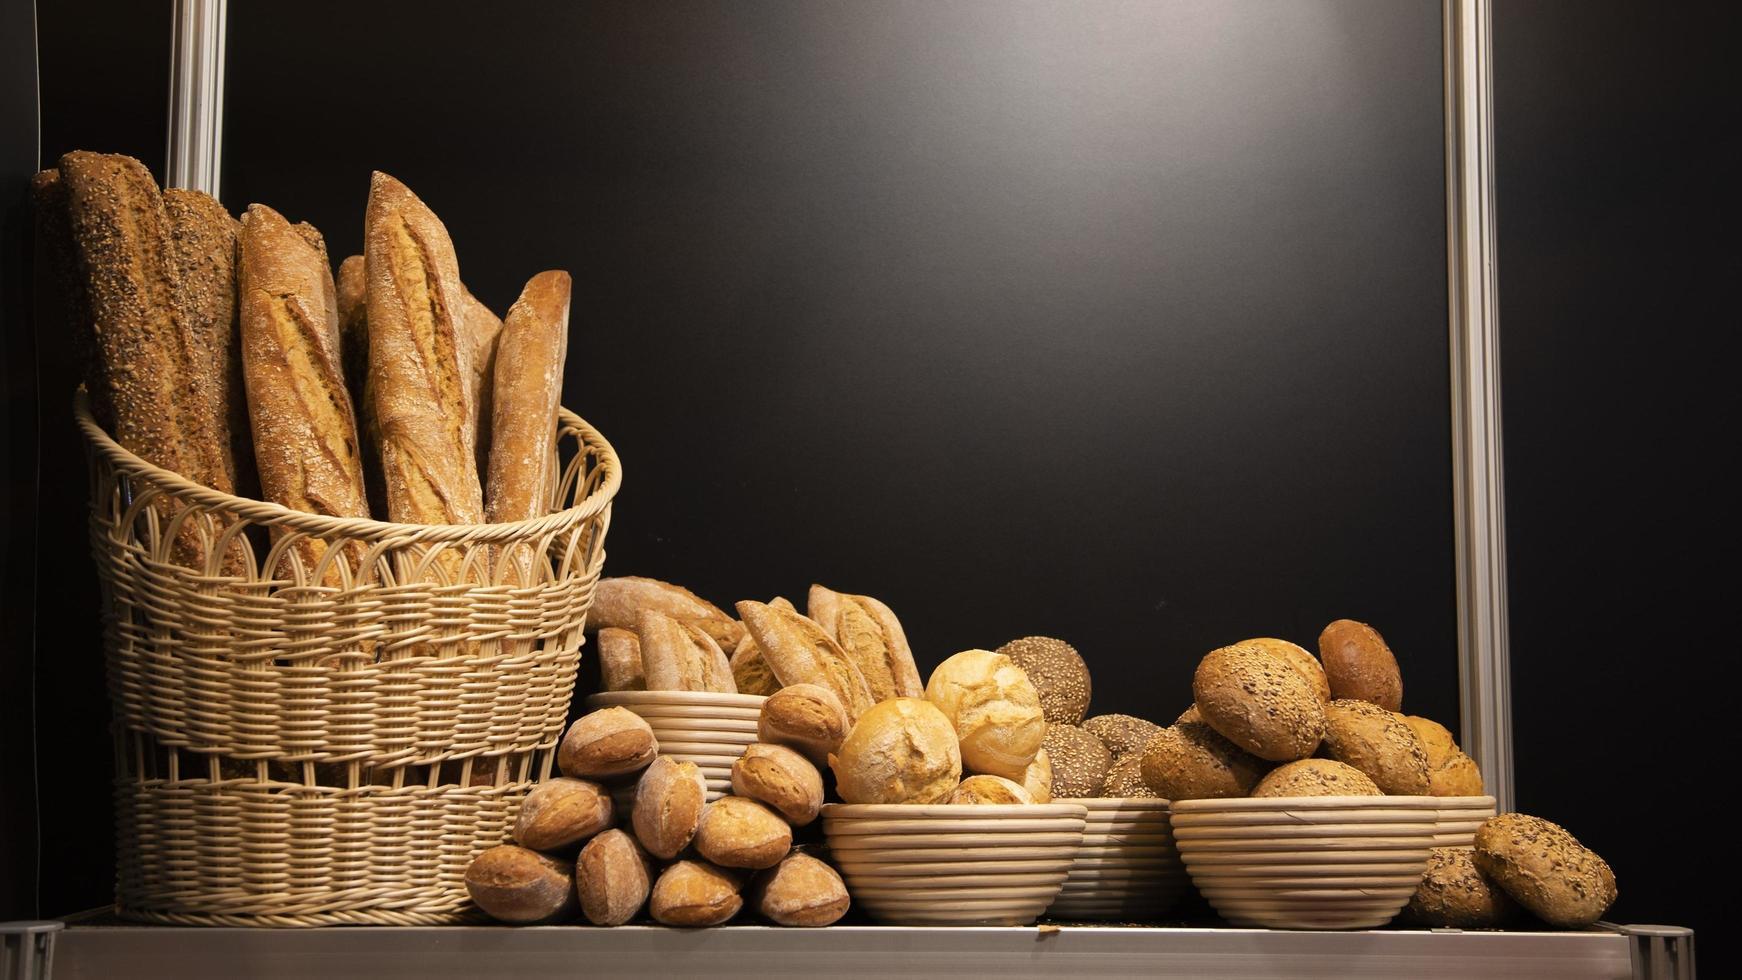 Baked bread on illuminated background photo